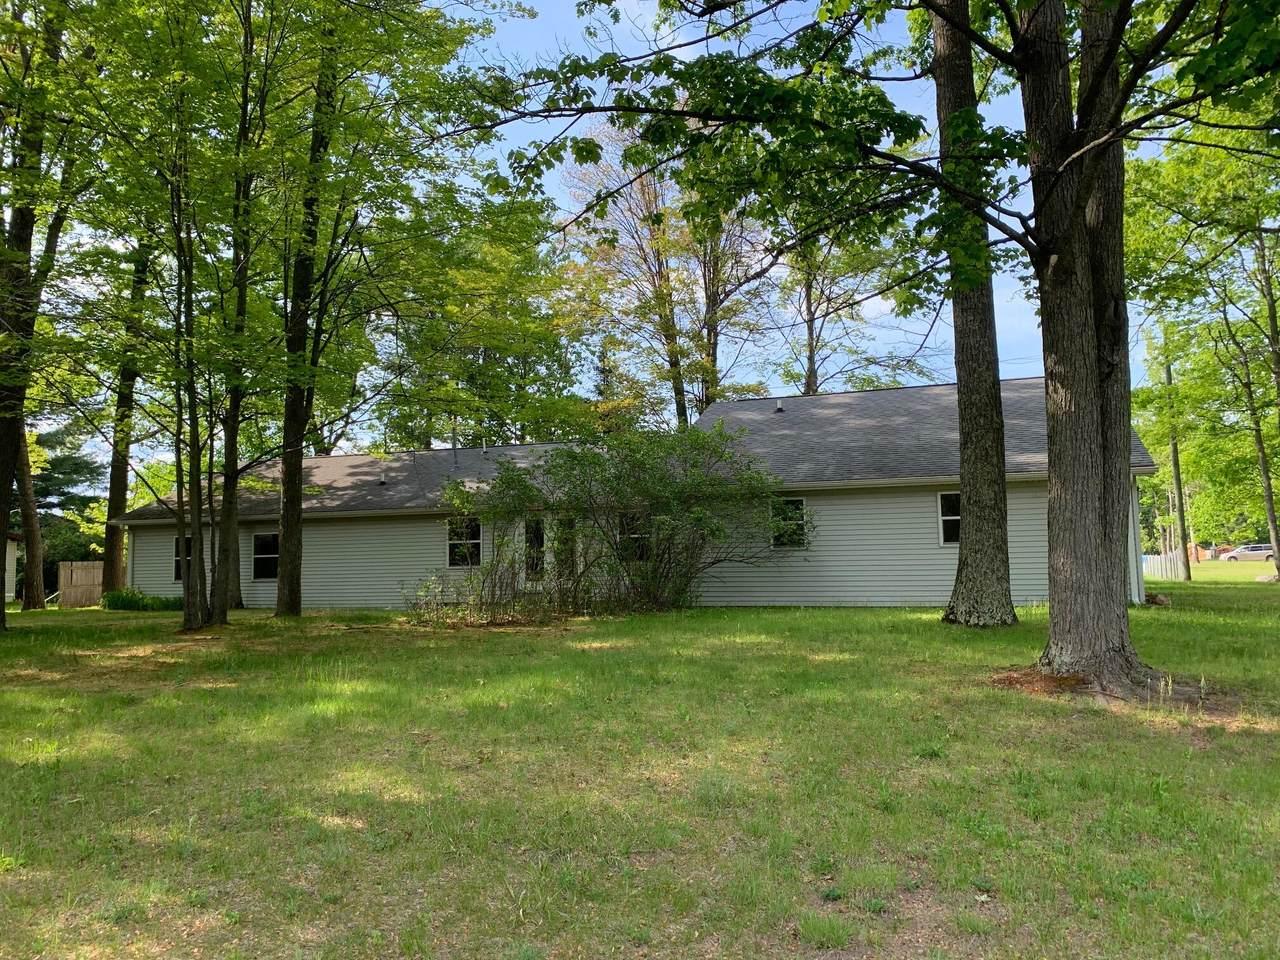 2385 Houghton Lake Dr - Photo 1